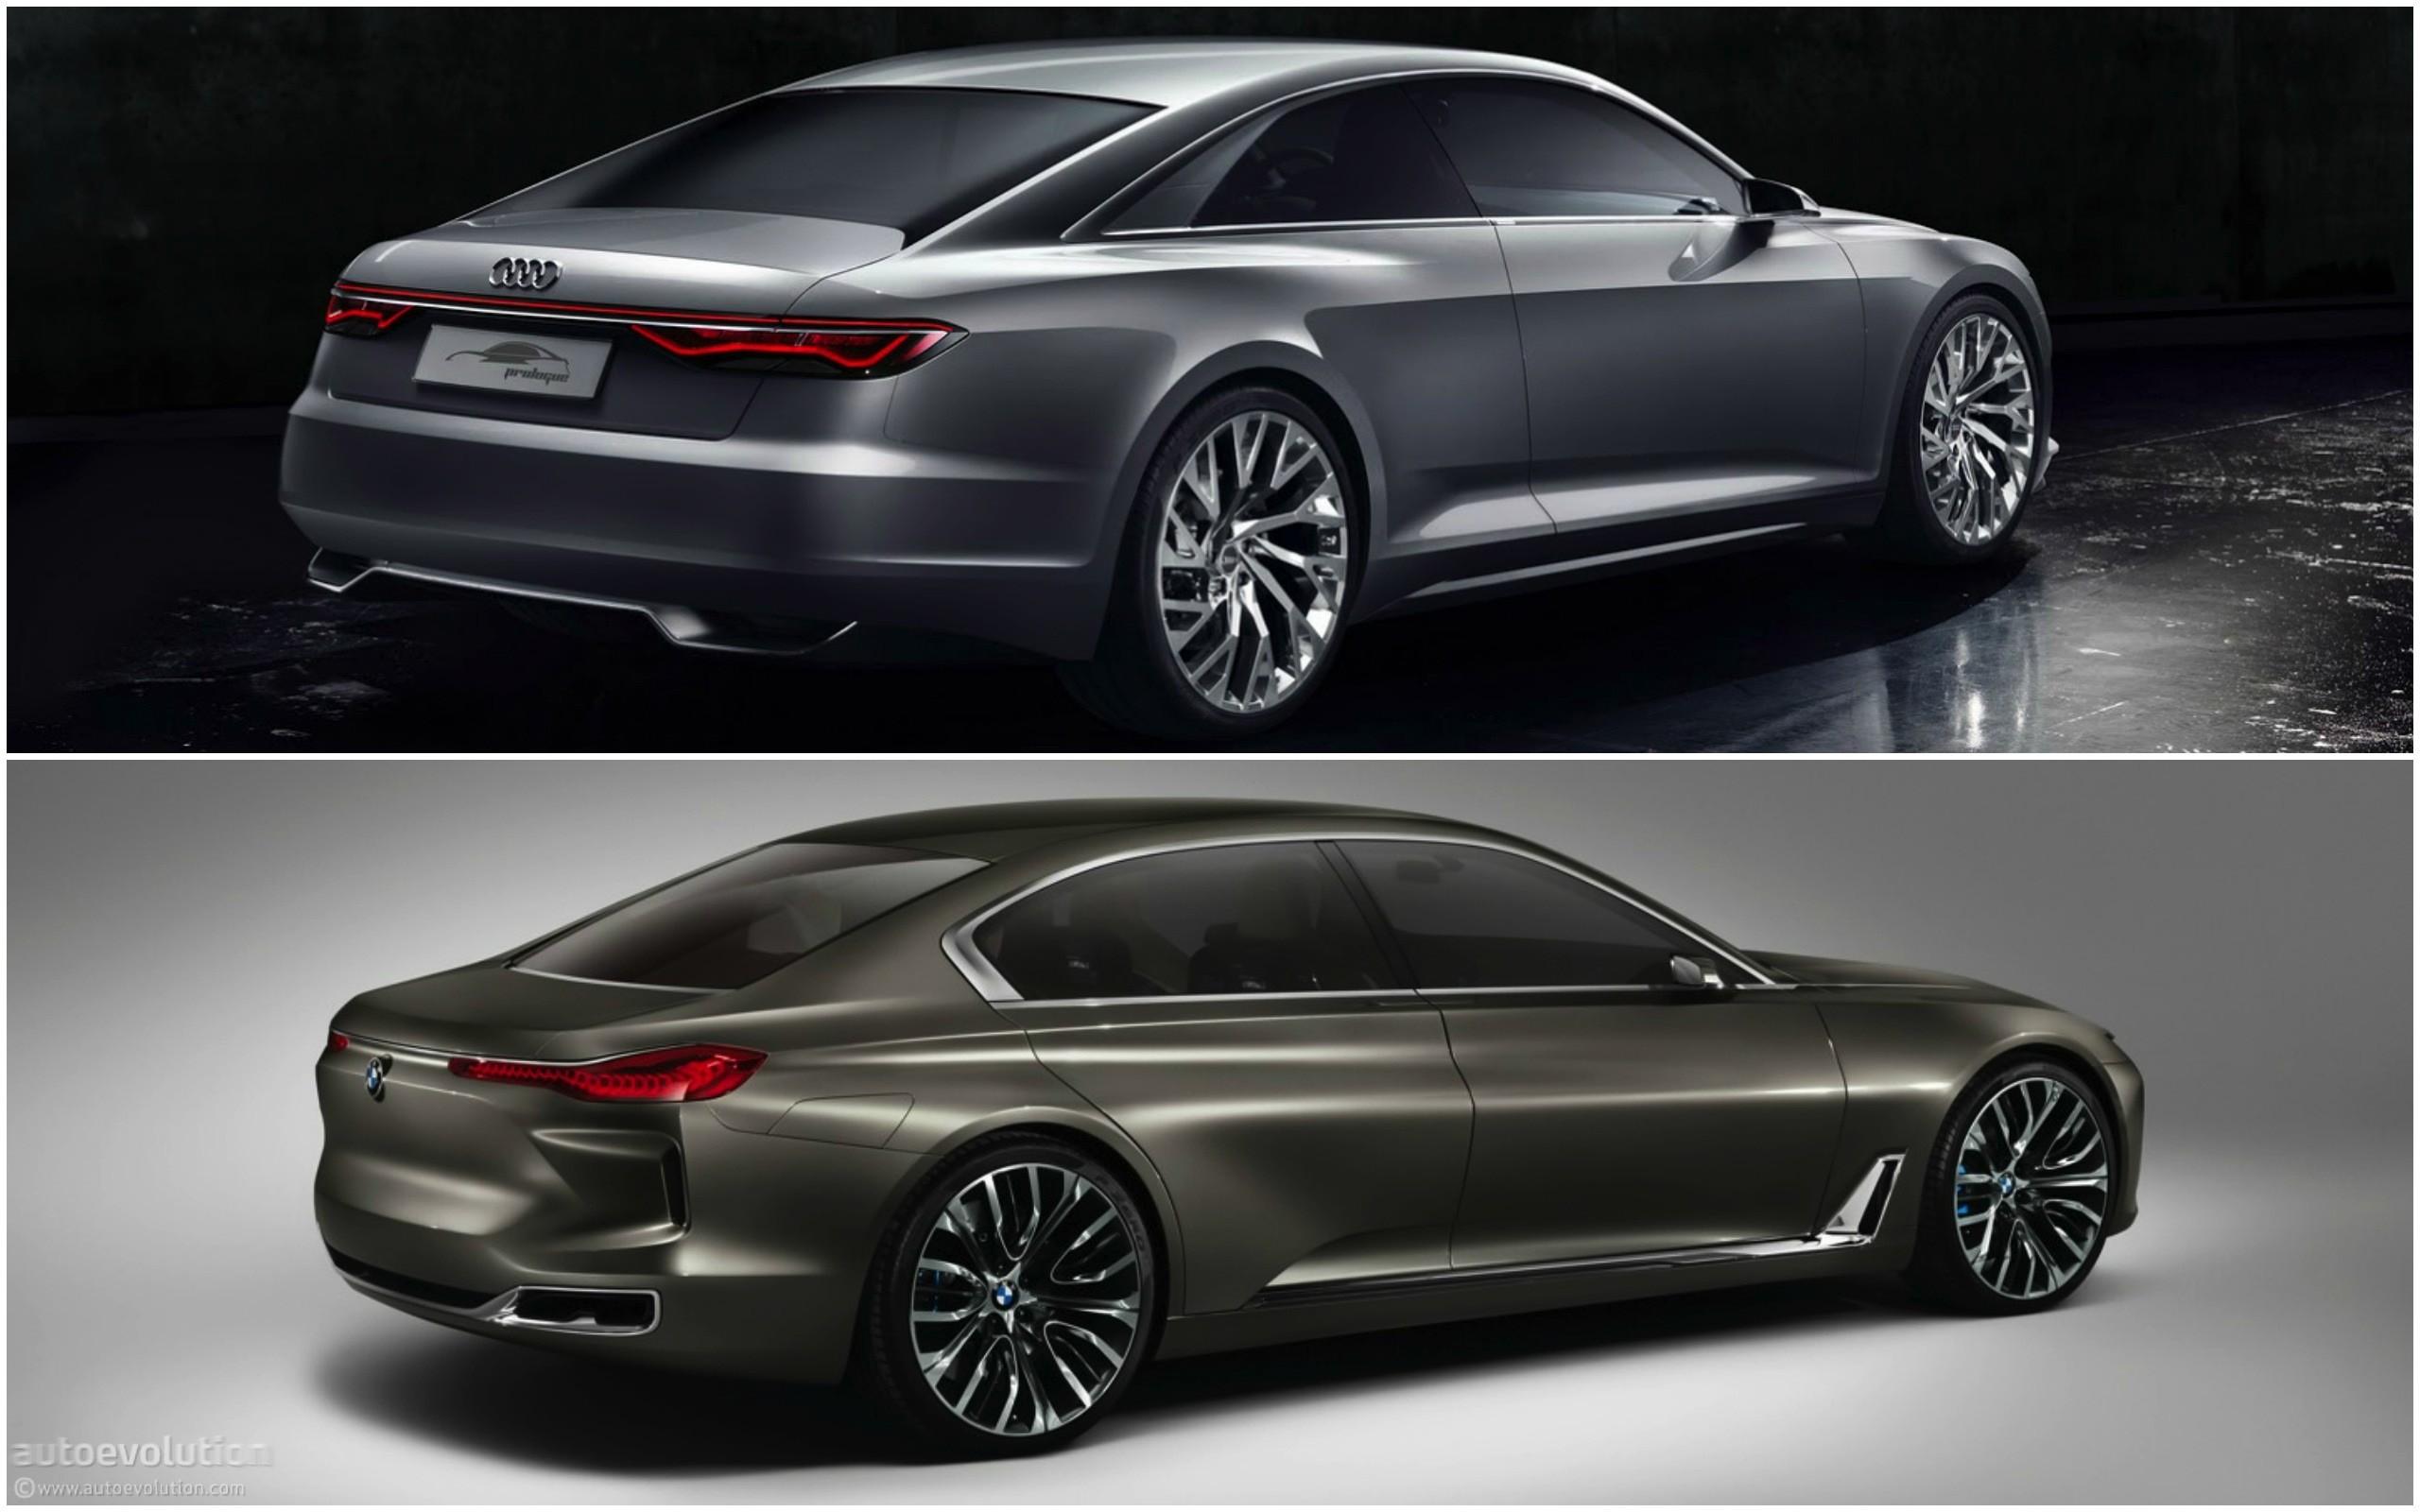 Photo Comparison: BMW Vision Future Luxury Concept versus Audi ...